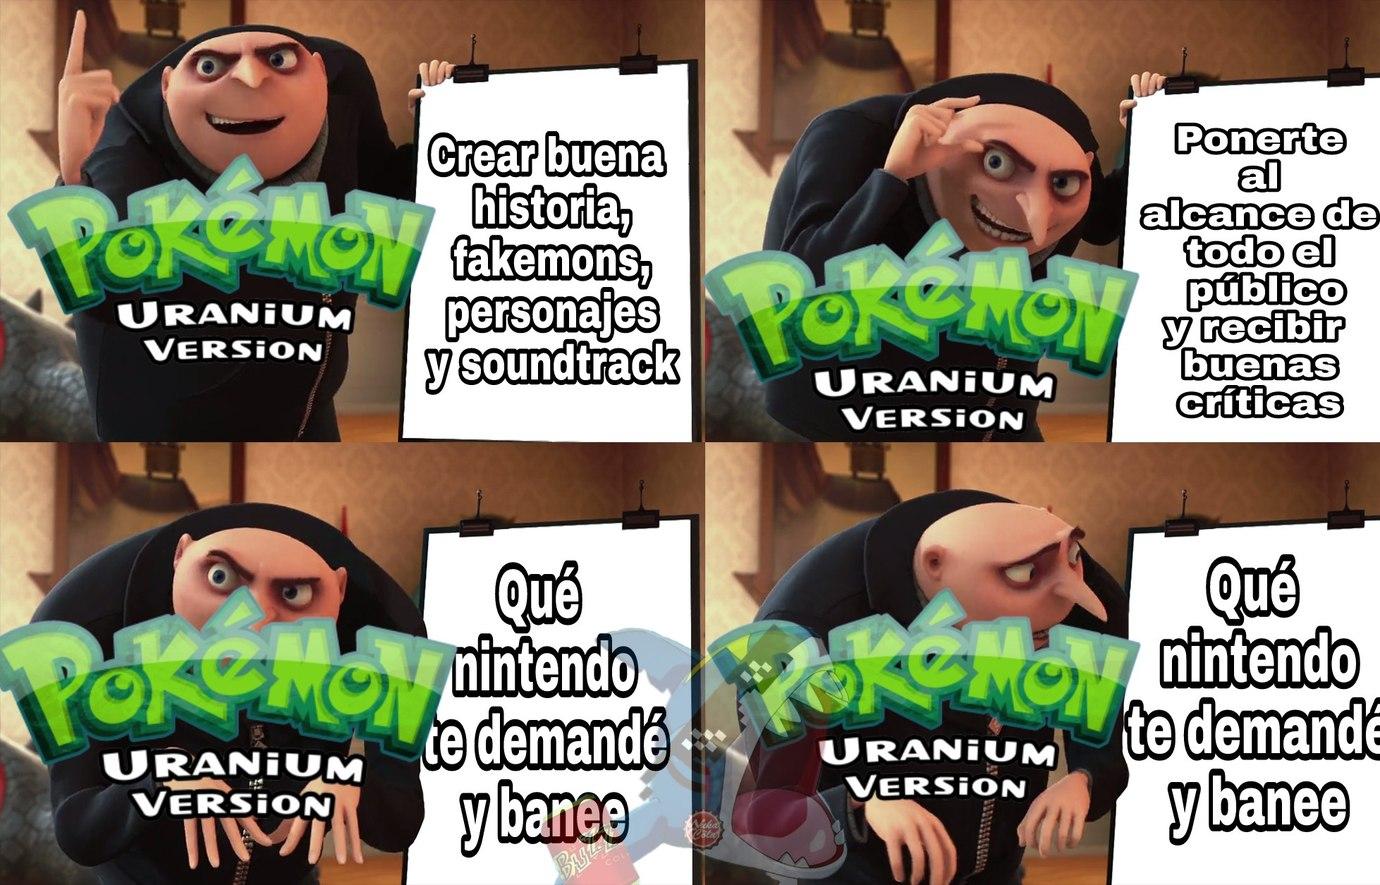 Que juegazo es el Pokémon Uranium - meme